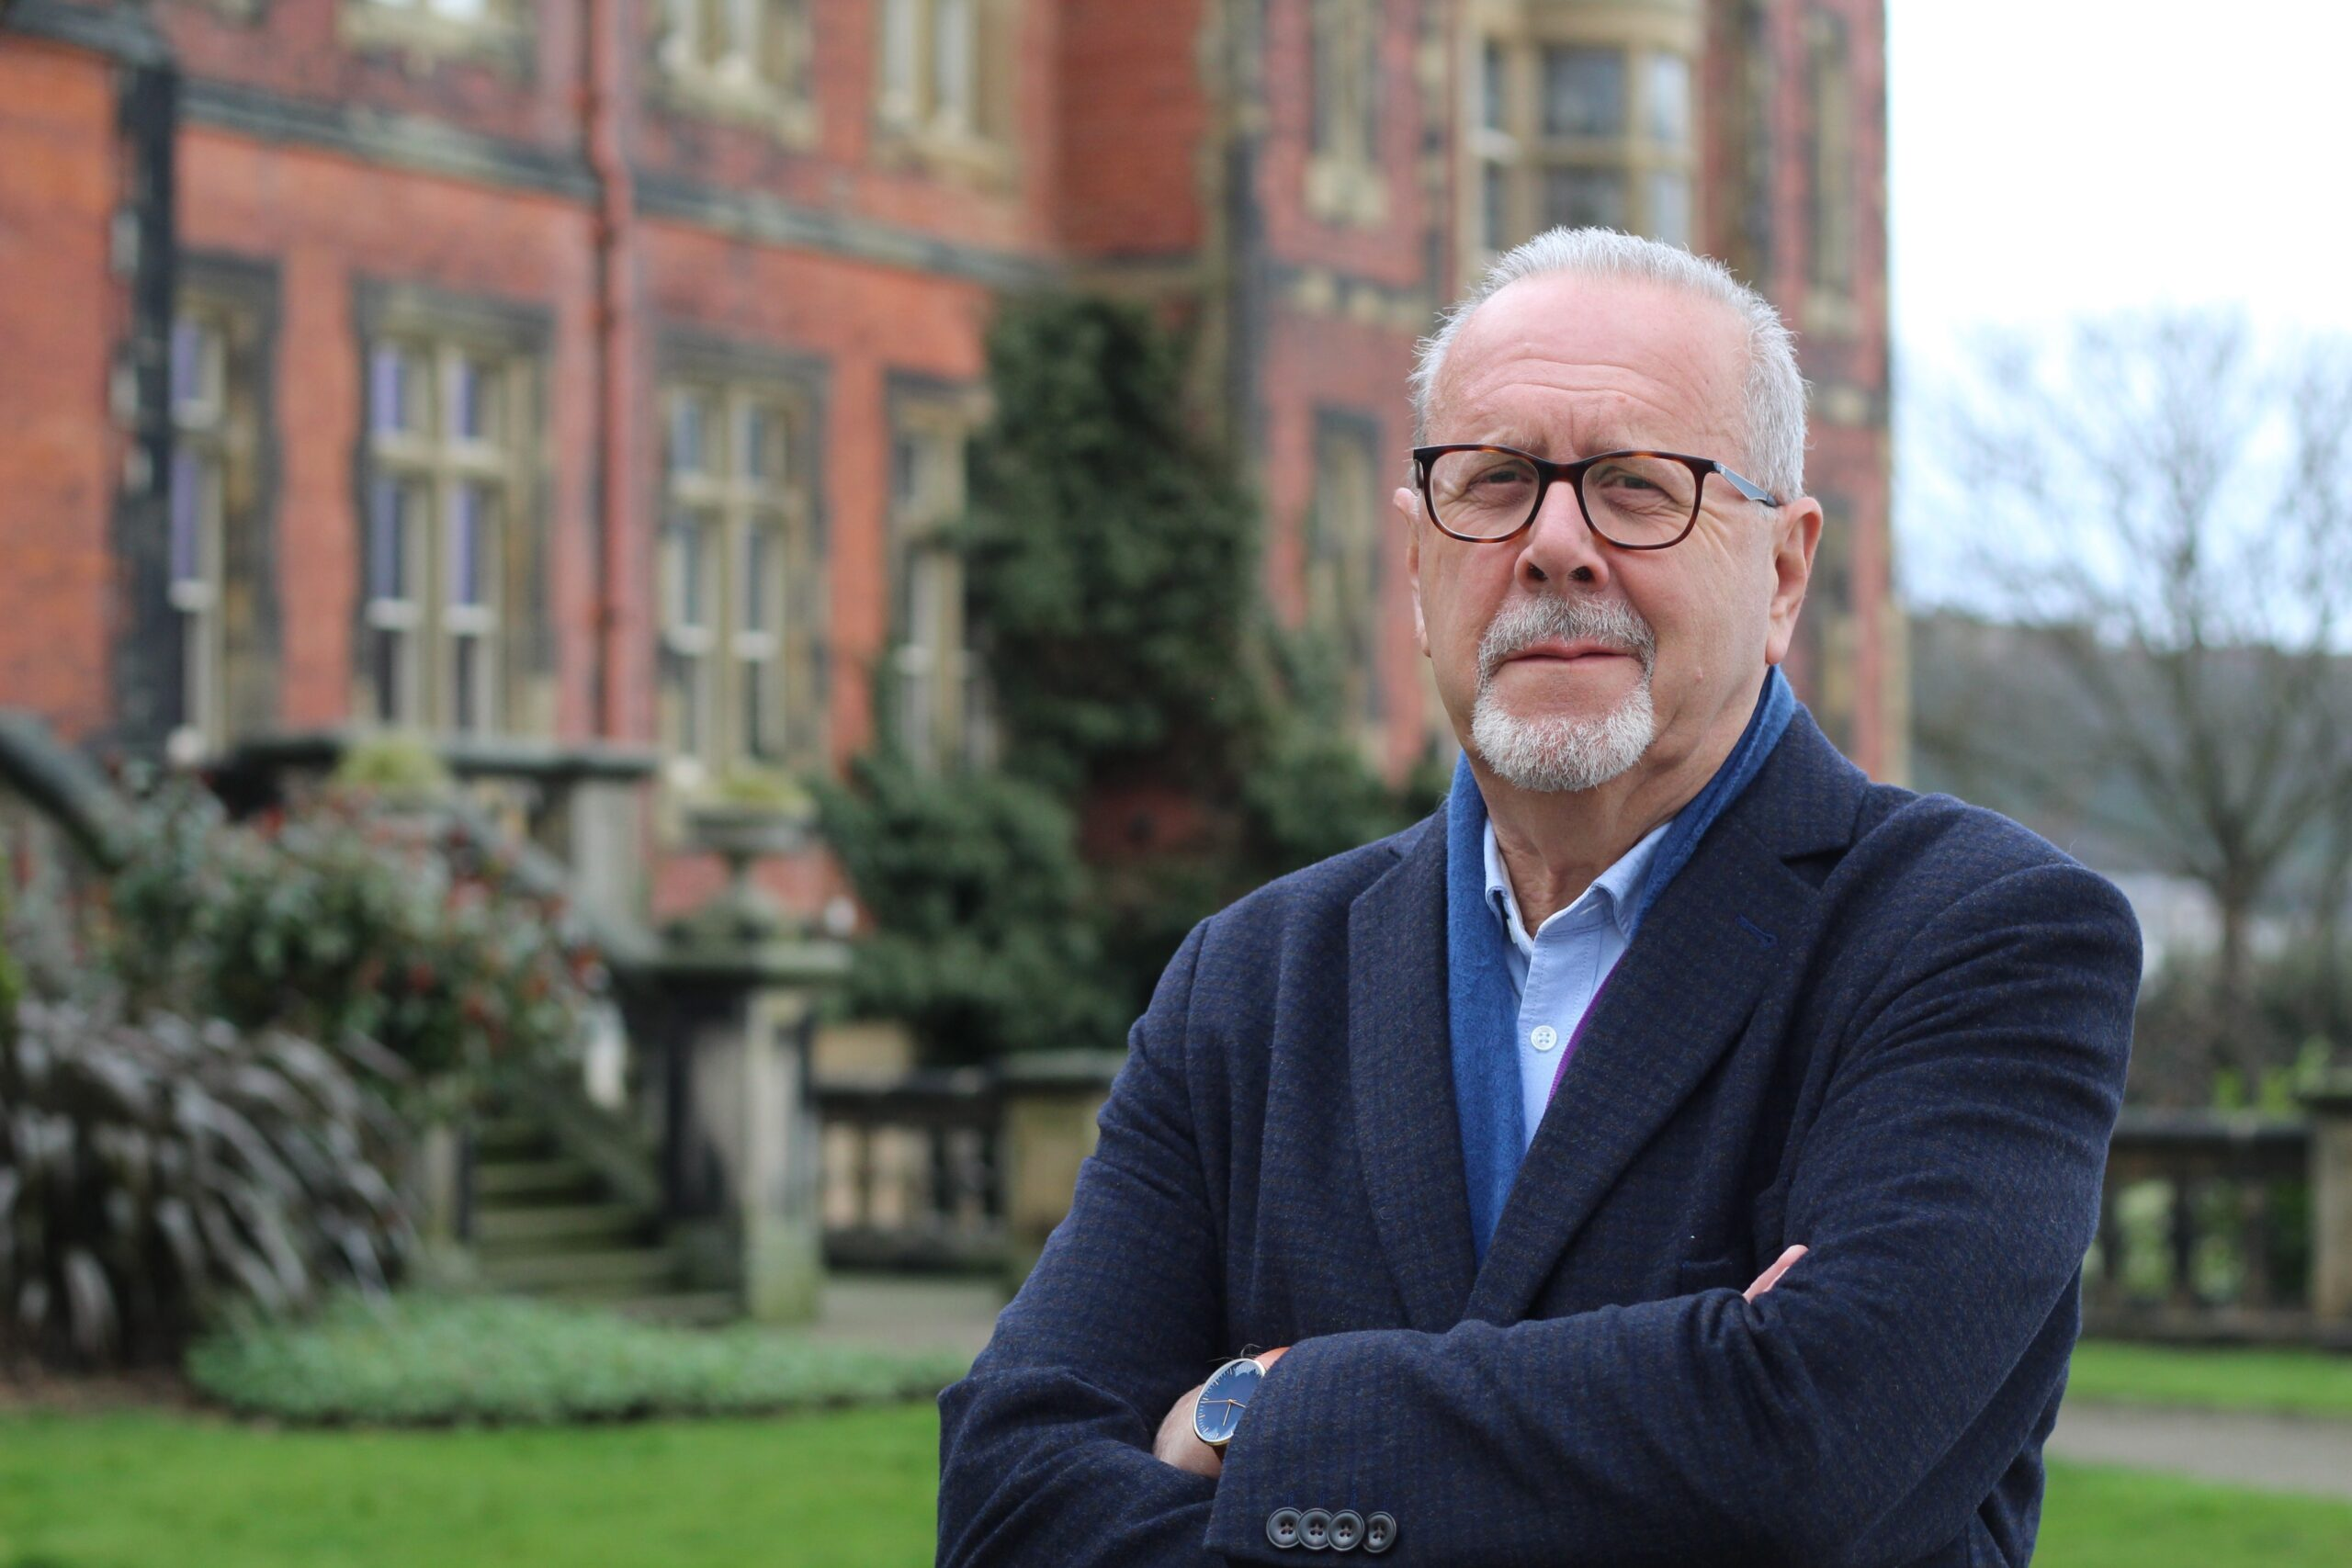 Cllr Steve Siddons, leader of Scarborough Borough Council.